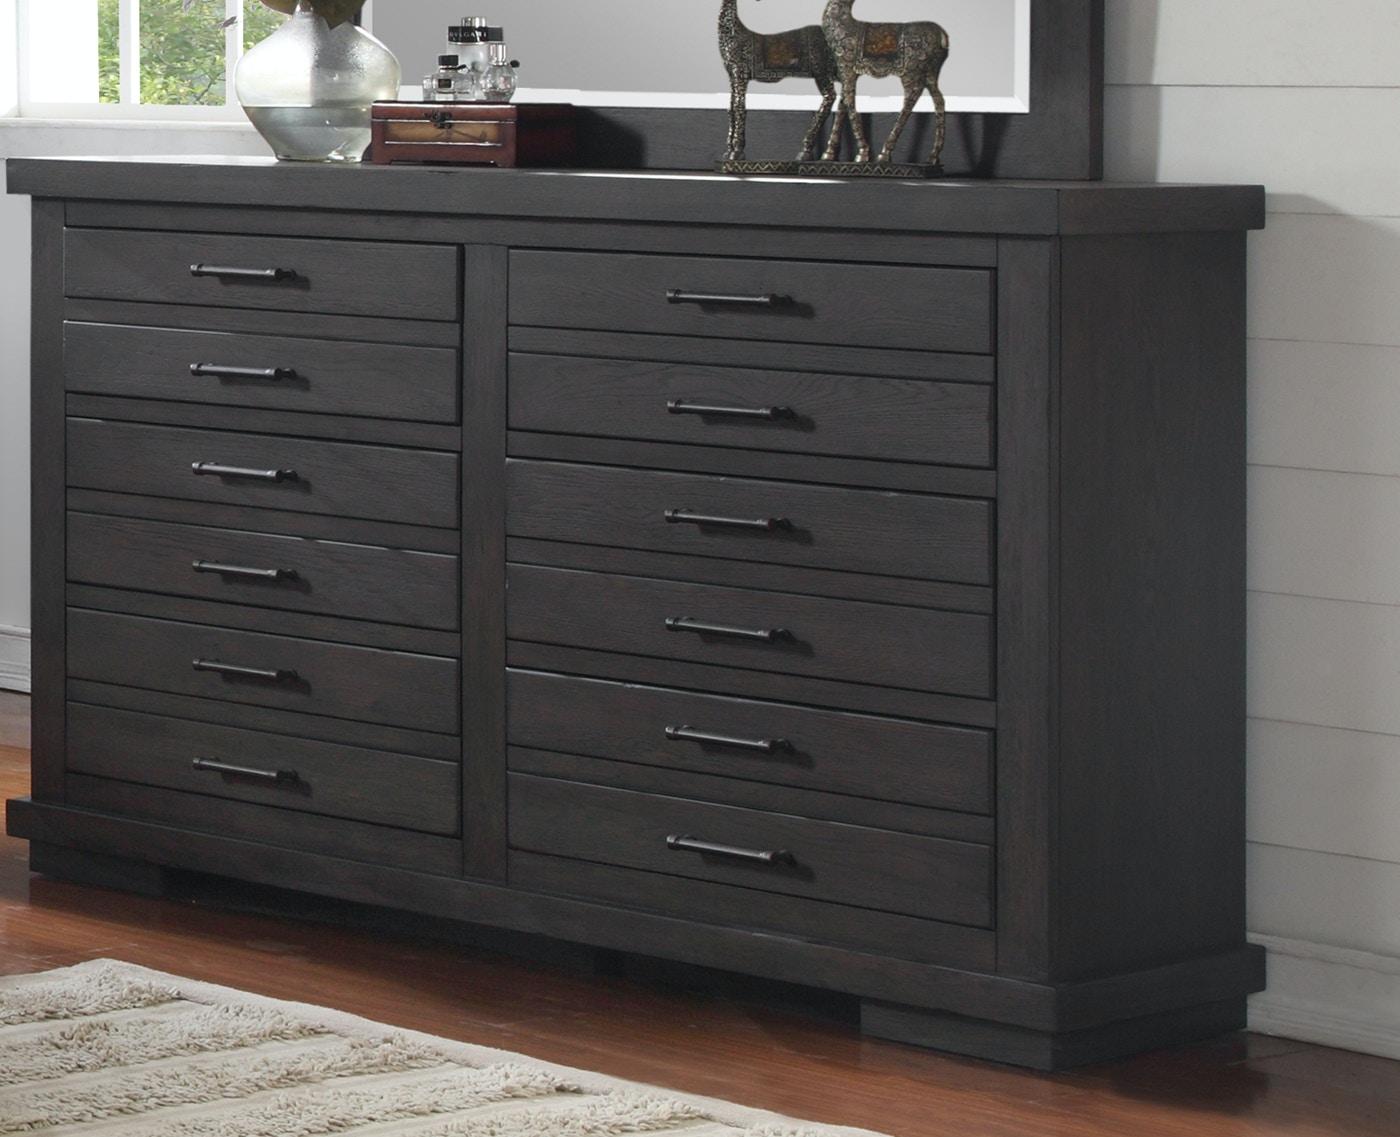 Holland House Revolution Dresser 058441